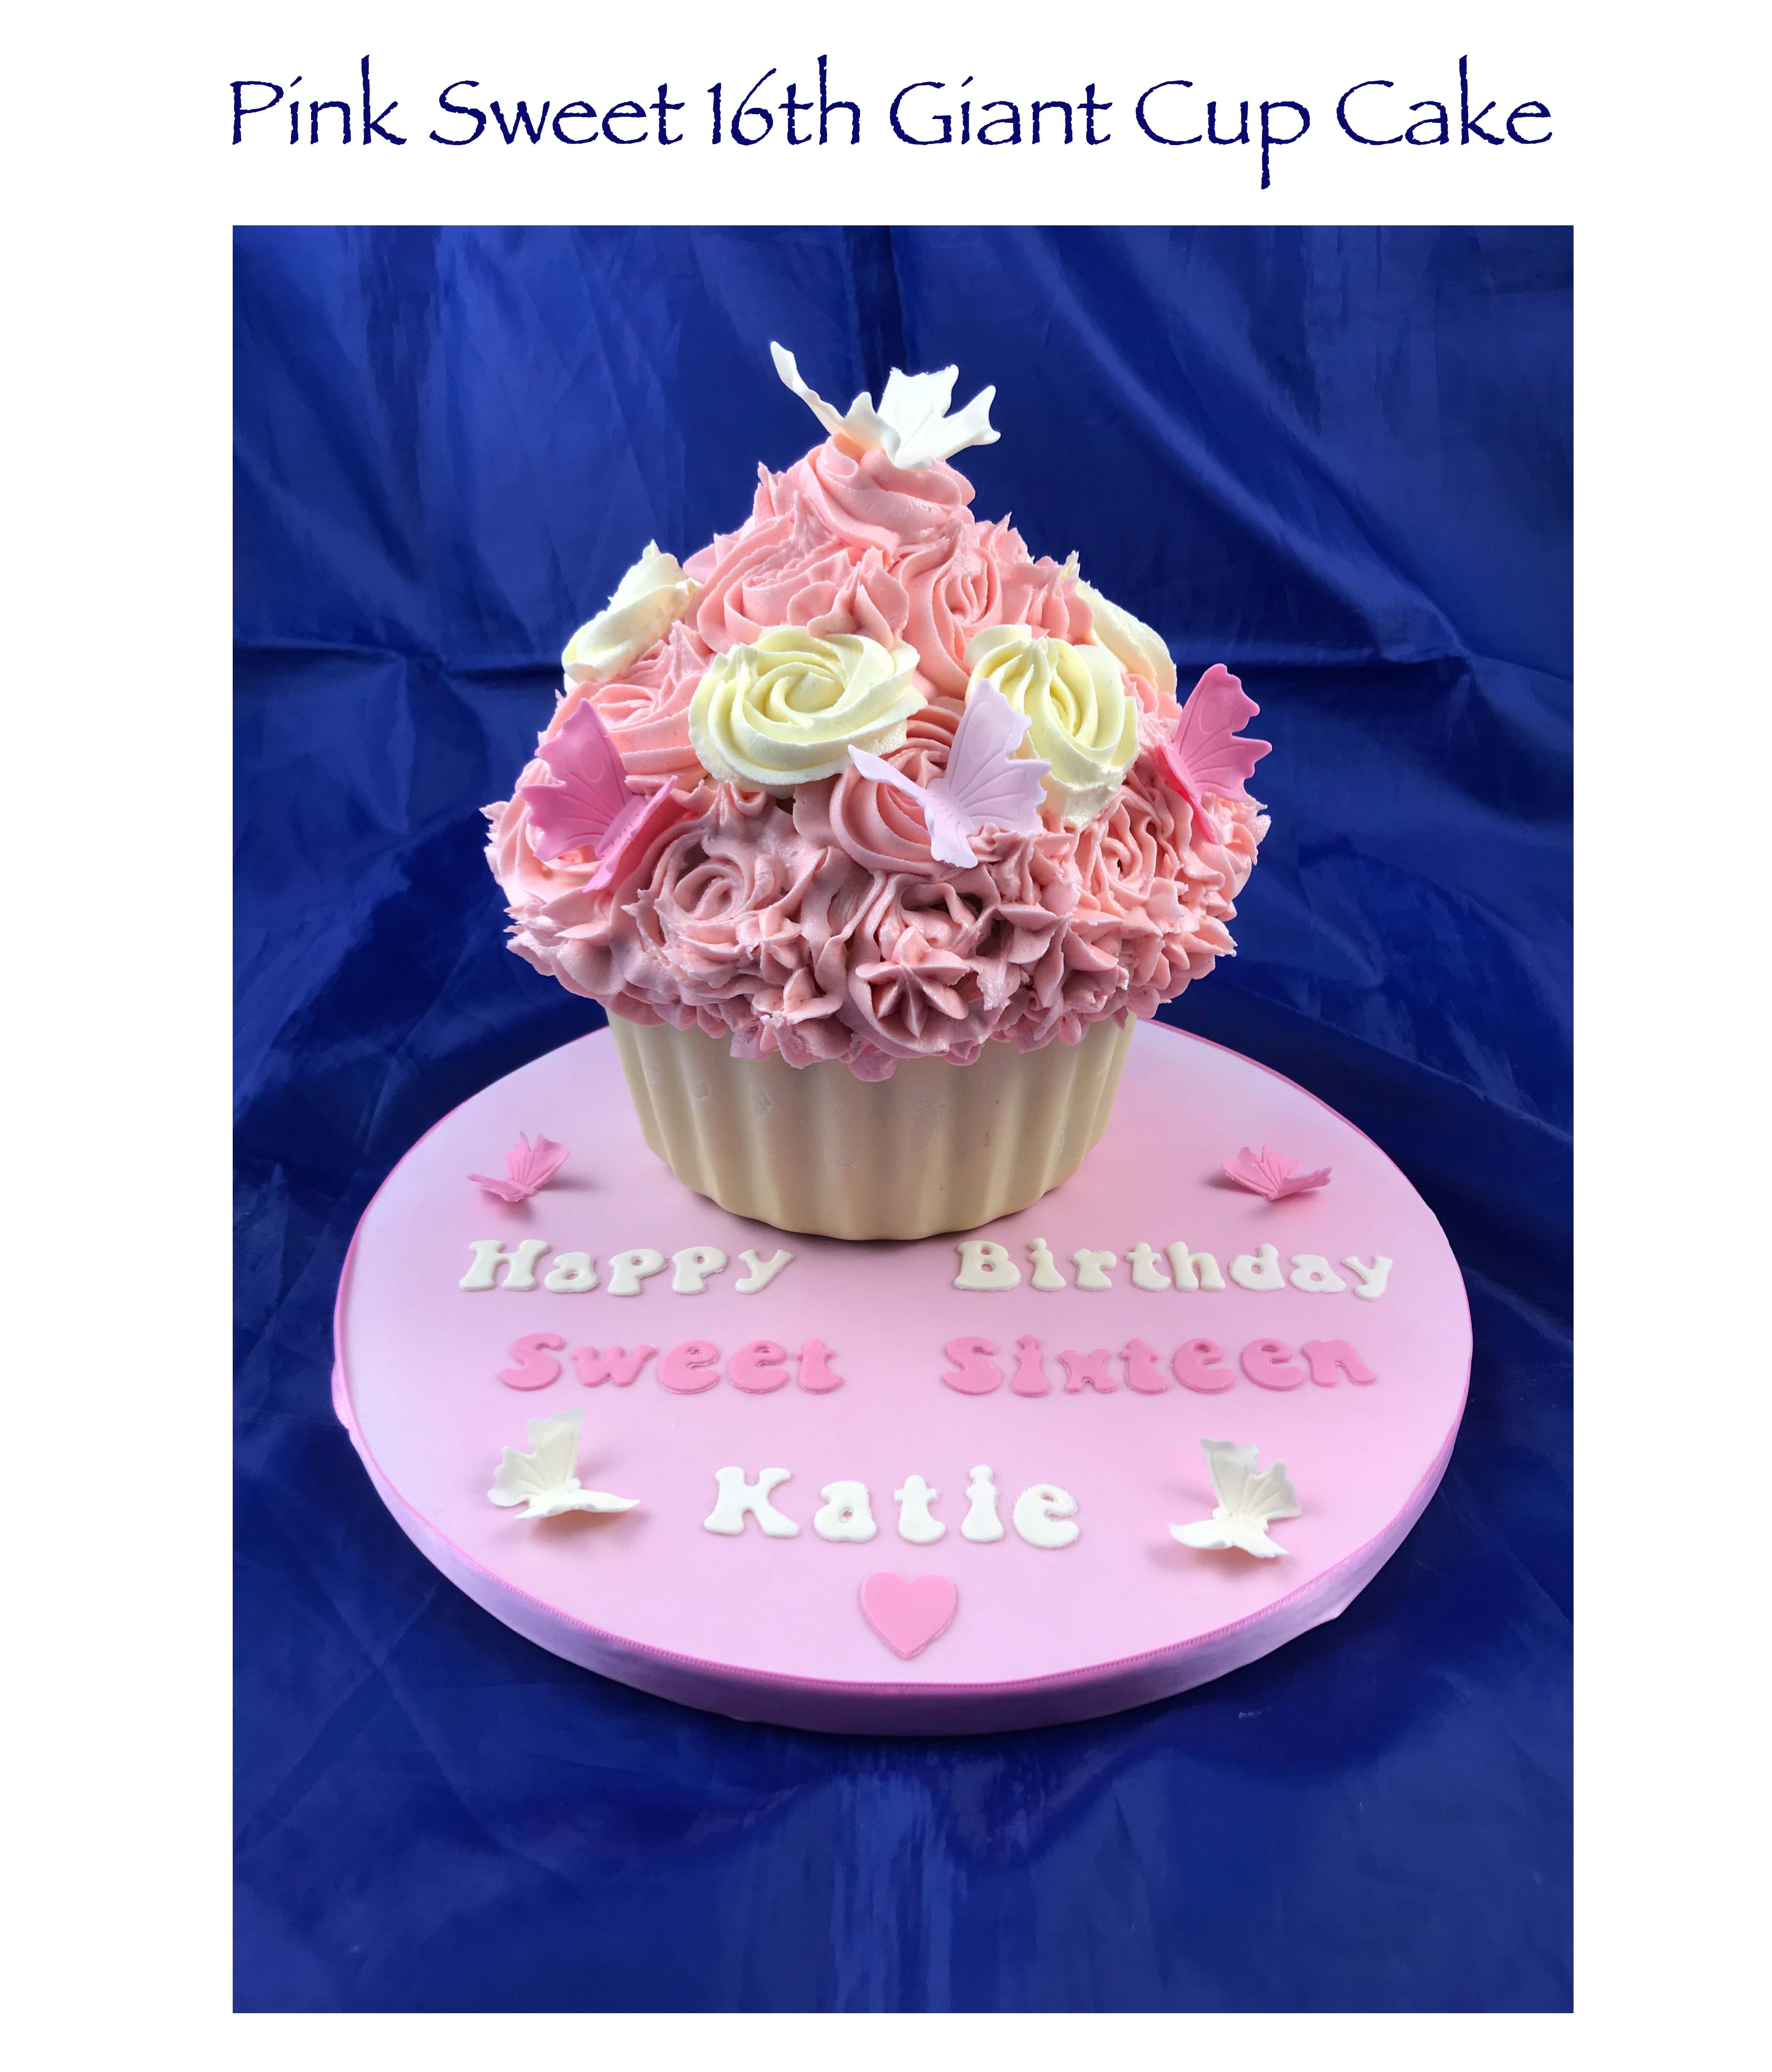 Pink Sweet Sixteenth Giant Cupcake